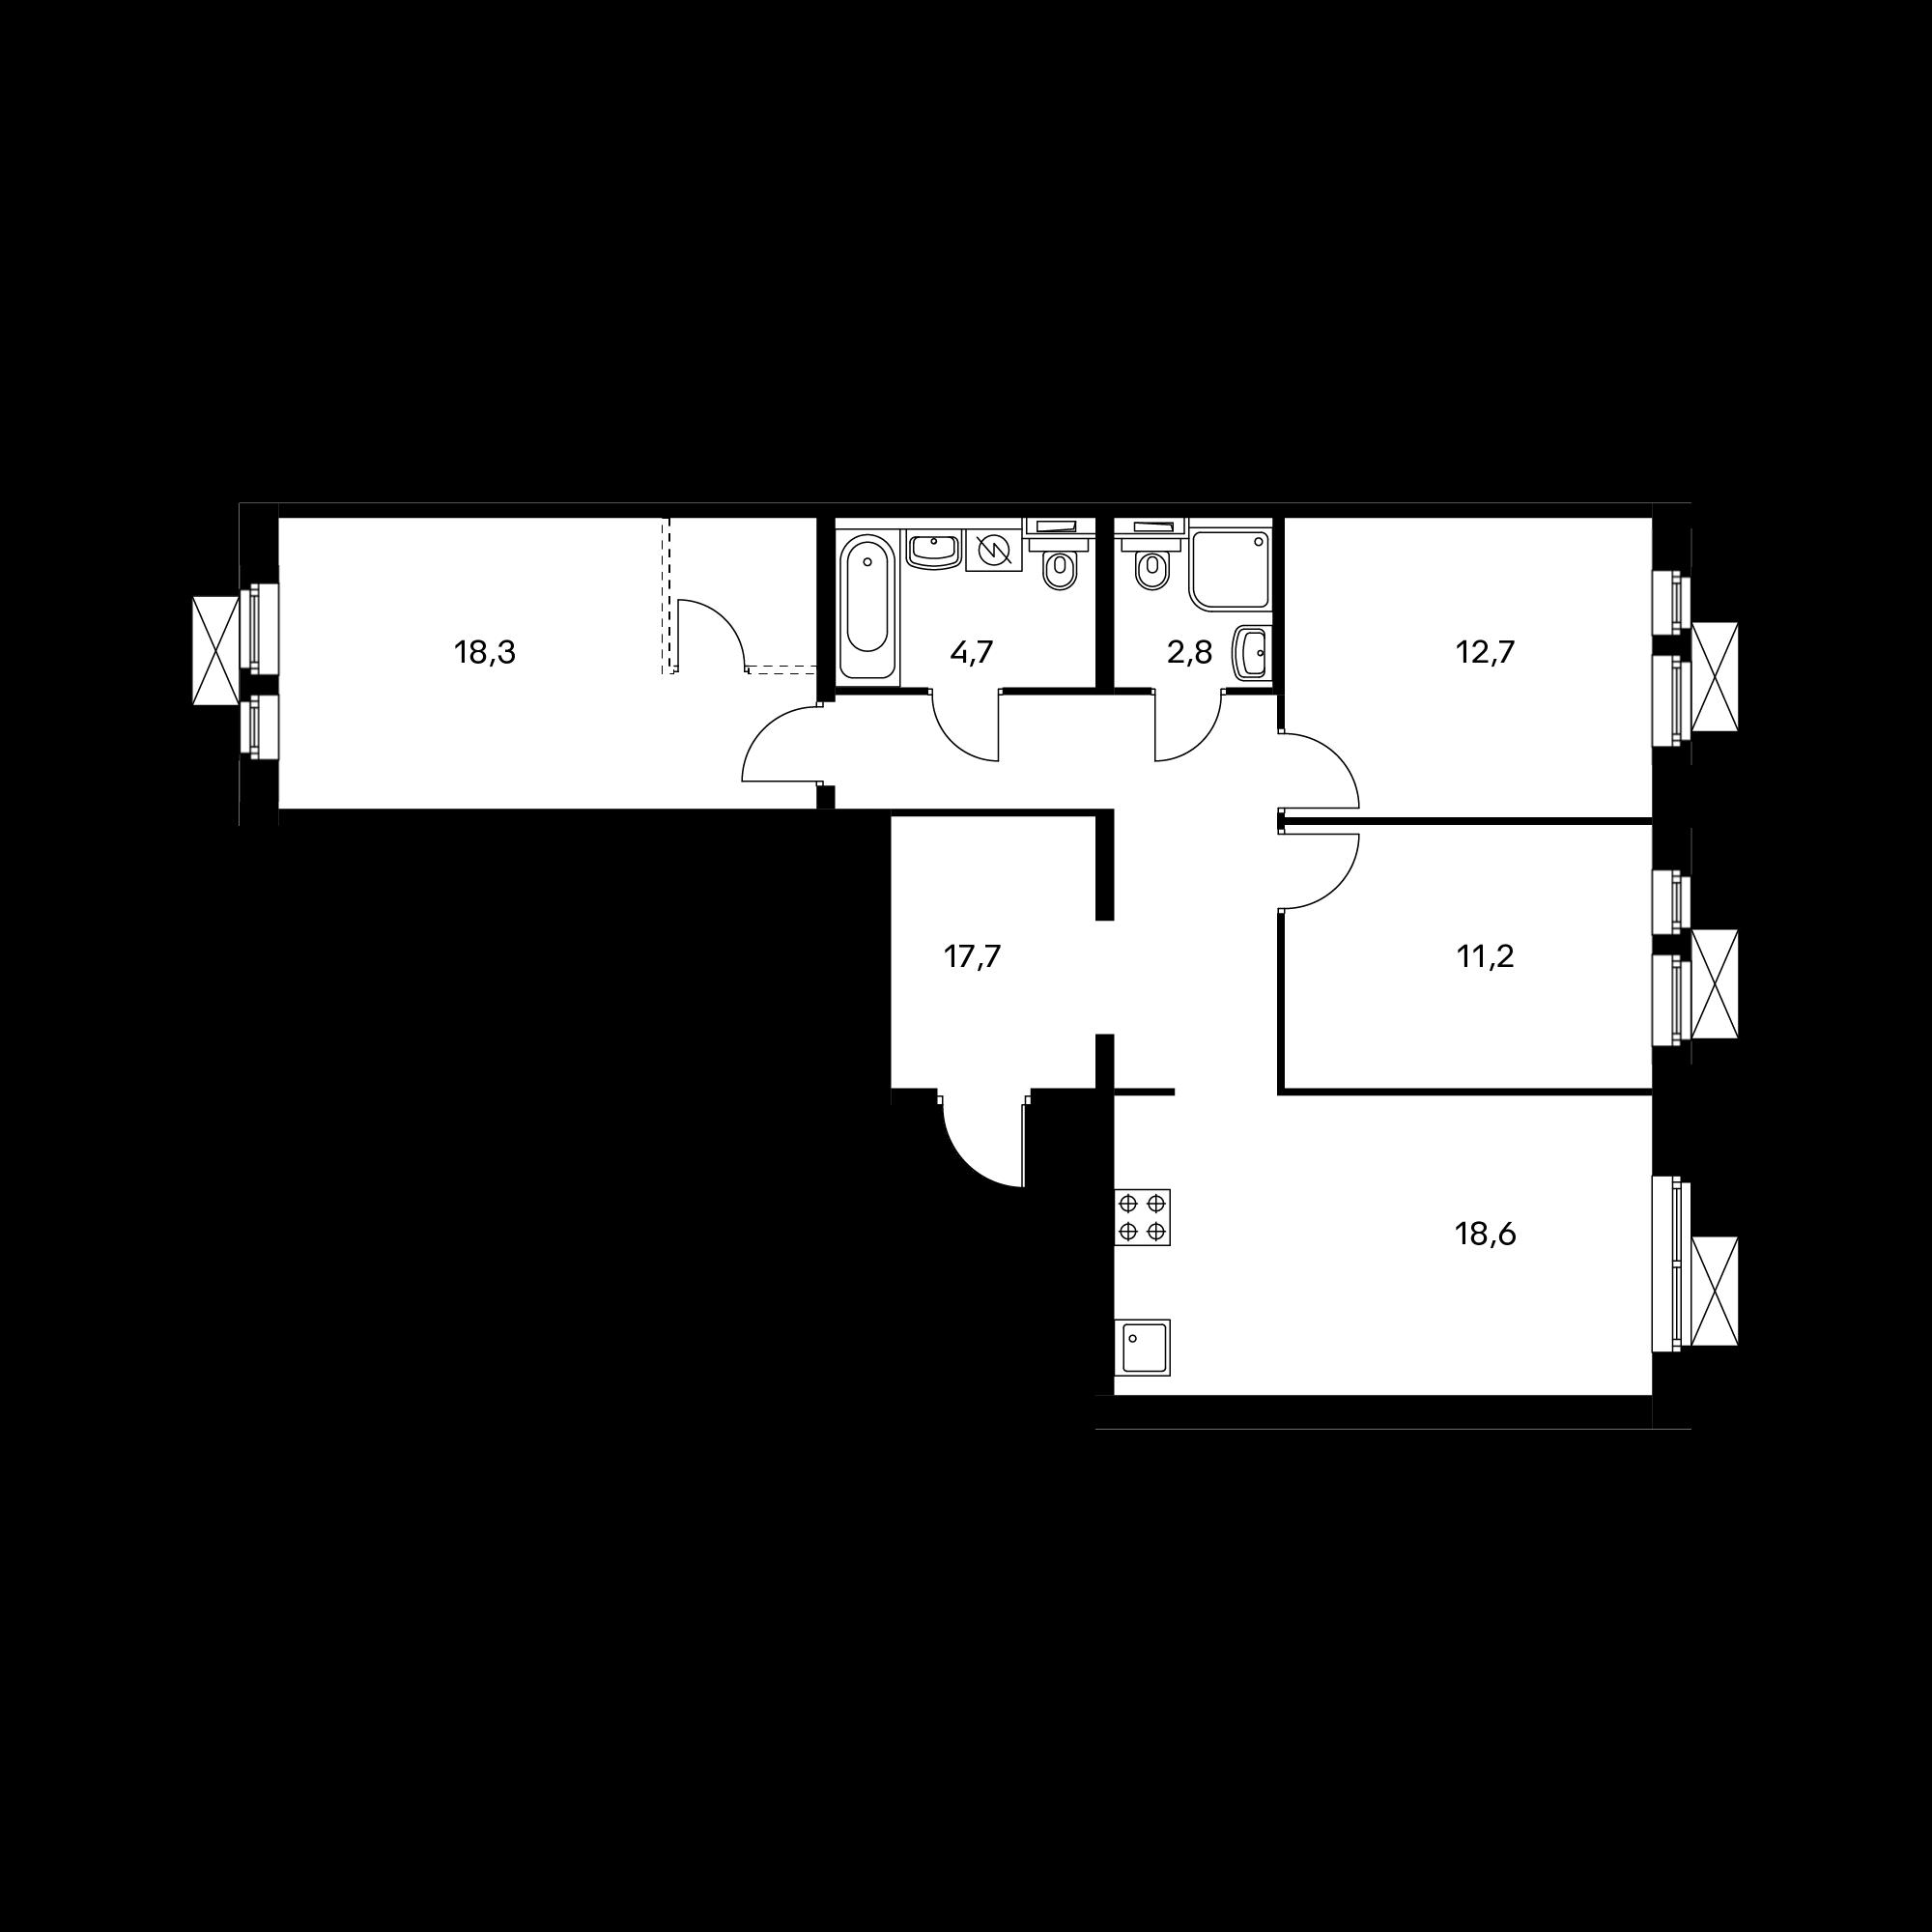 3EL3_9.6-7